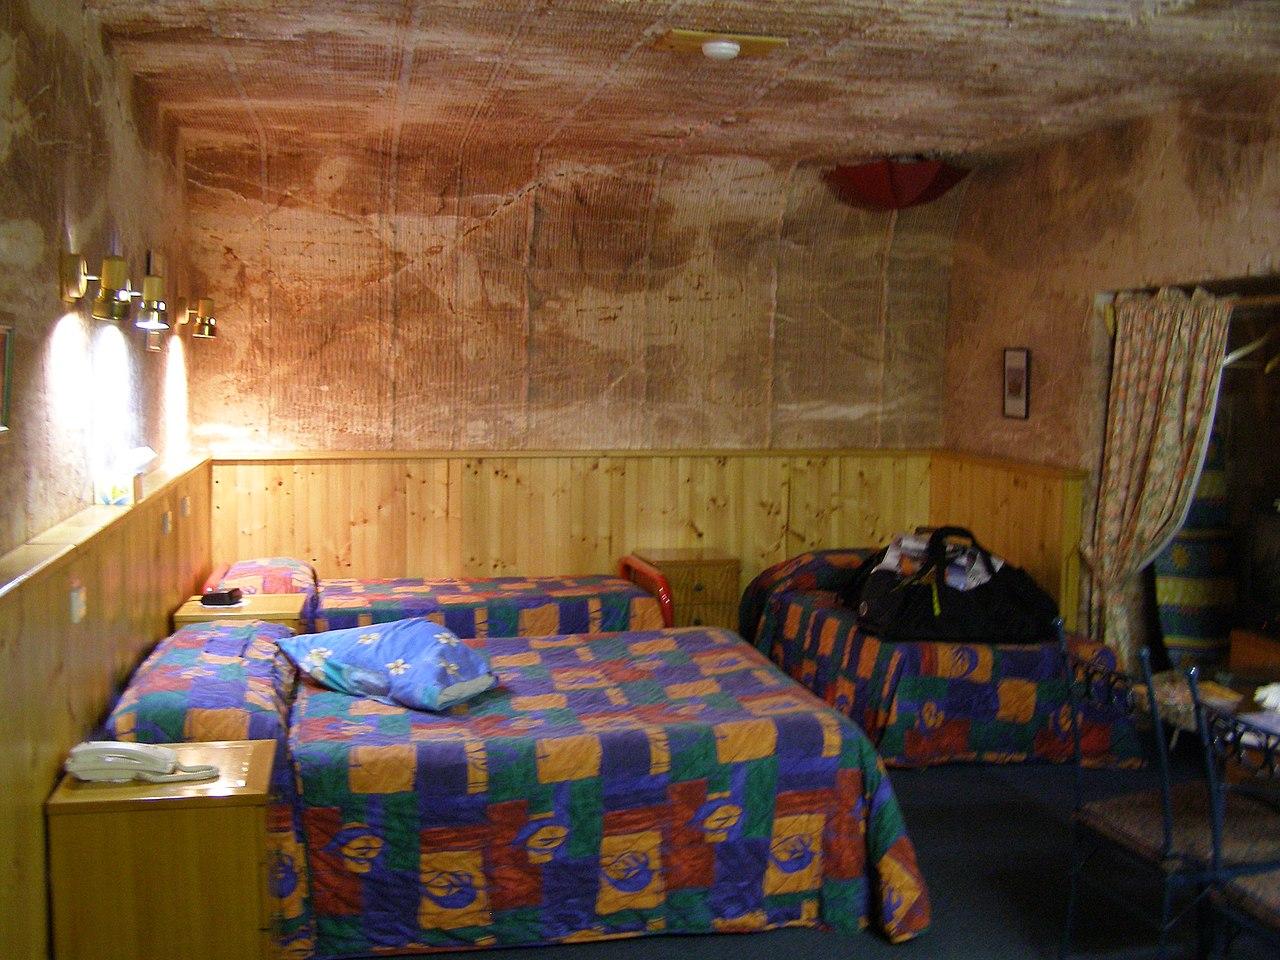 File:Coober Pedy underground motel room, 2007.jpg - Wikipedia